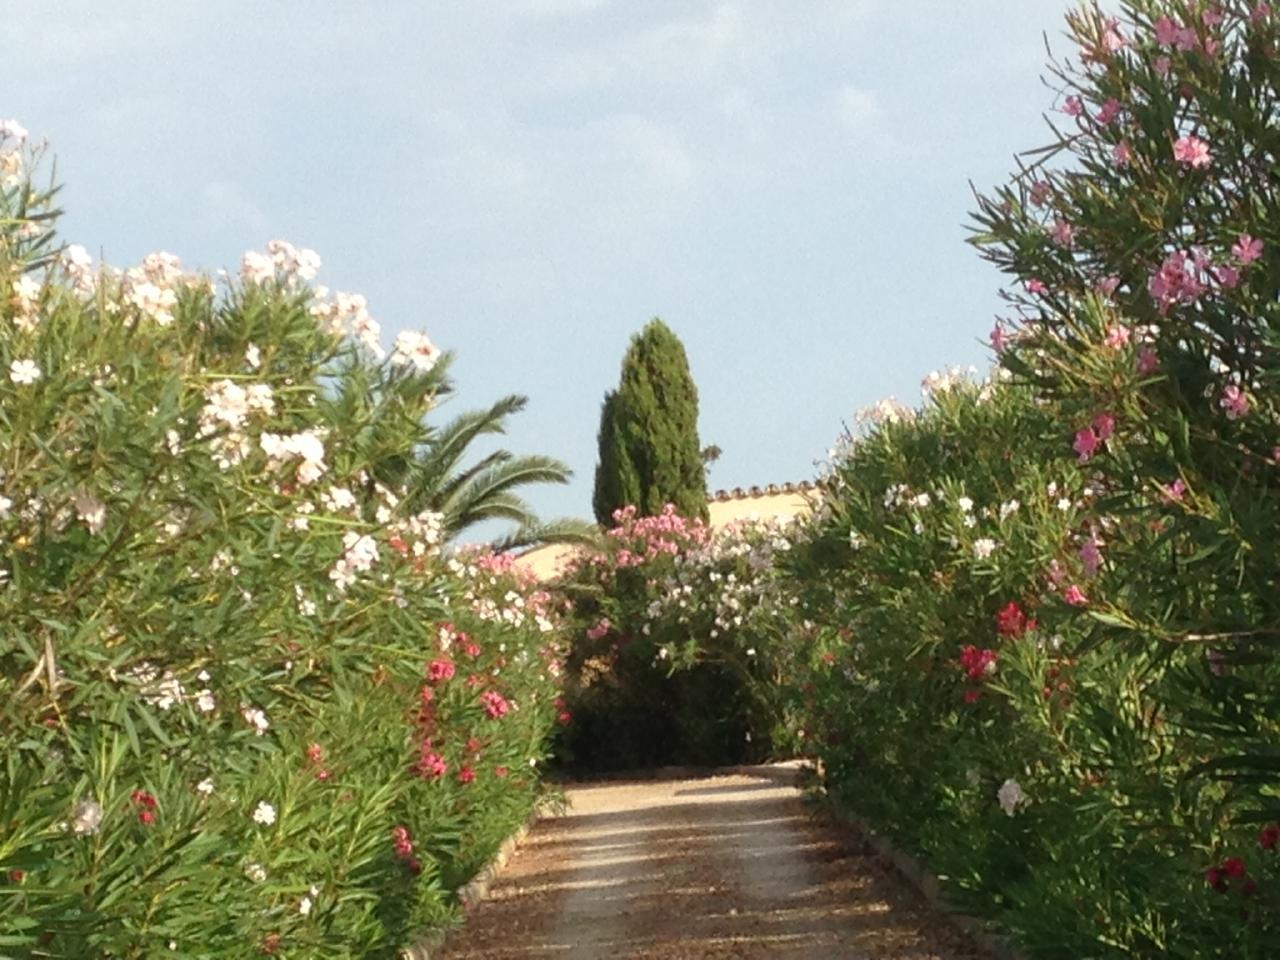 Ferienhaus Finca Casa de Campo, Montuiri (119689), Montuïri, Mallorca, Balearische Inseln, Spanien, Bild 22